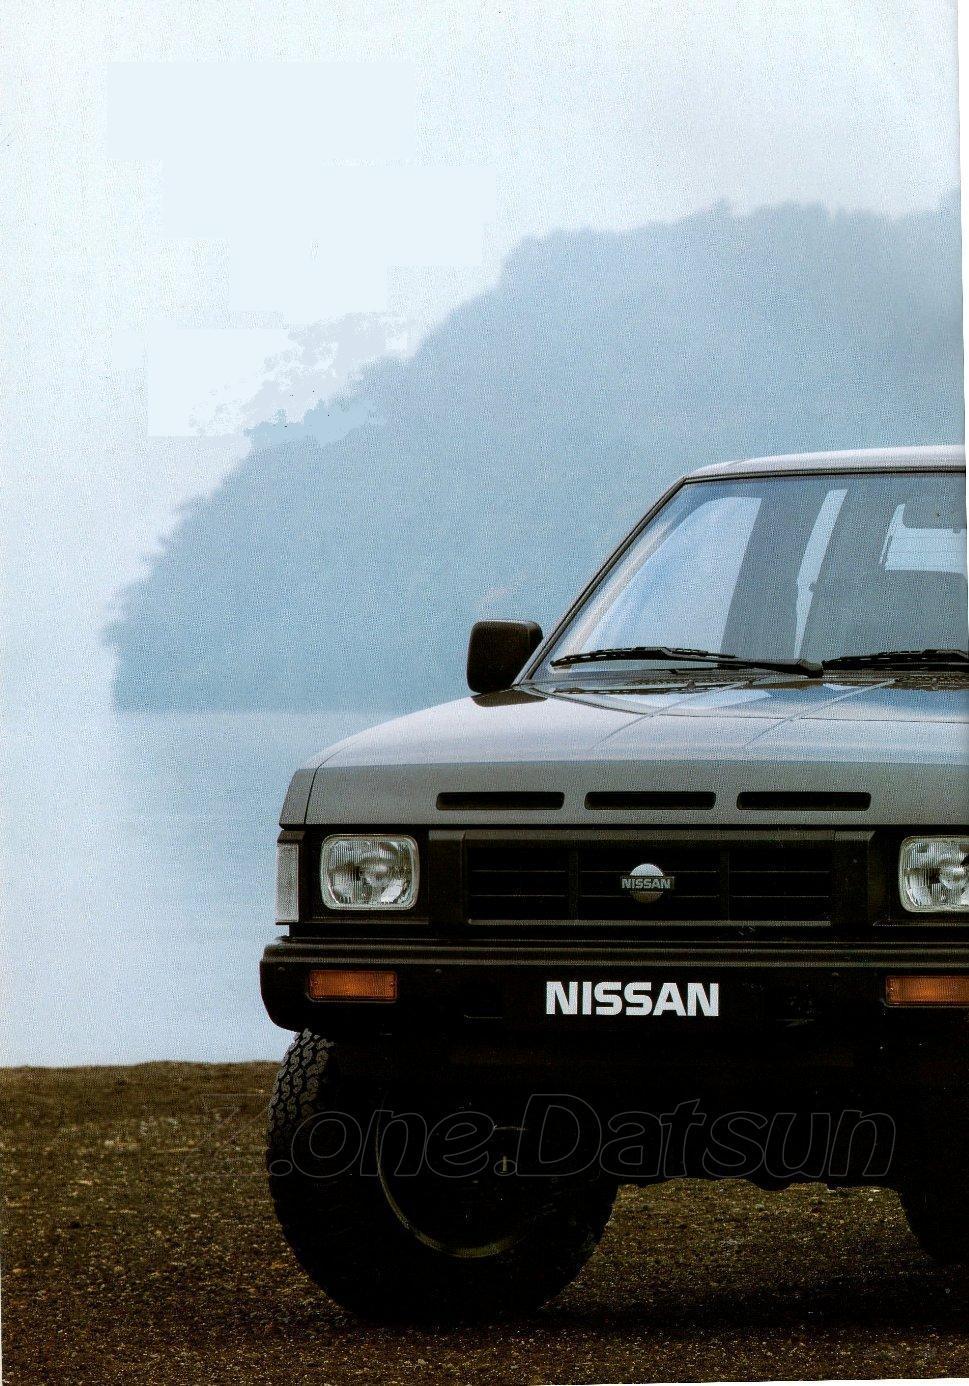 King Cab on 1990 Nissan King Cab